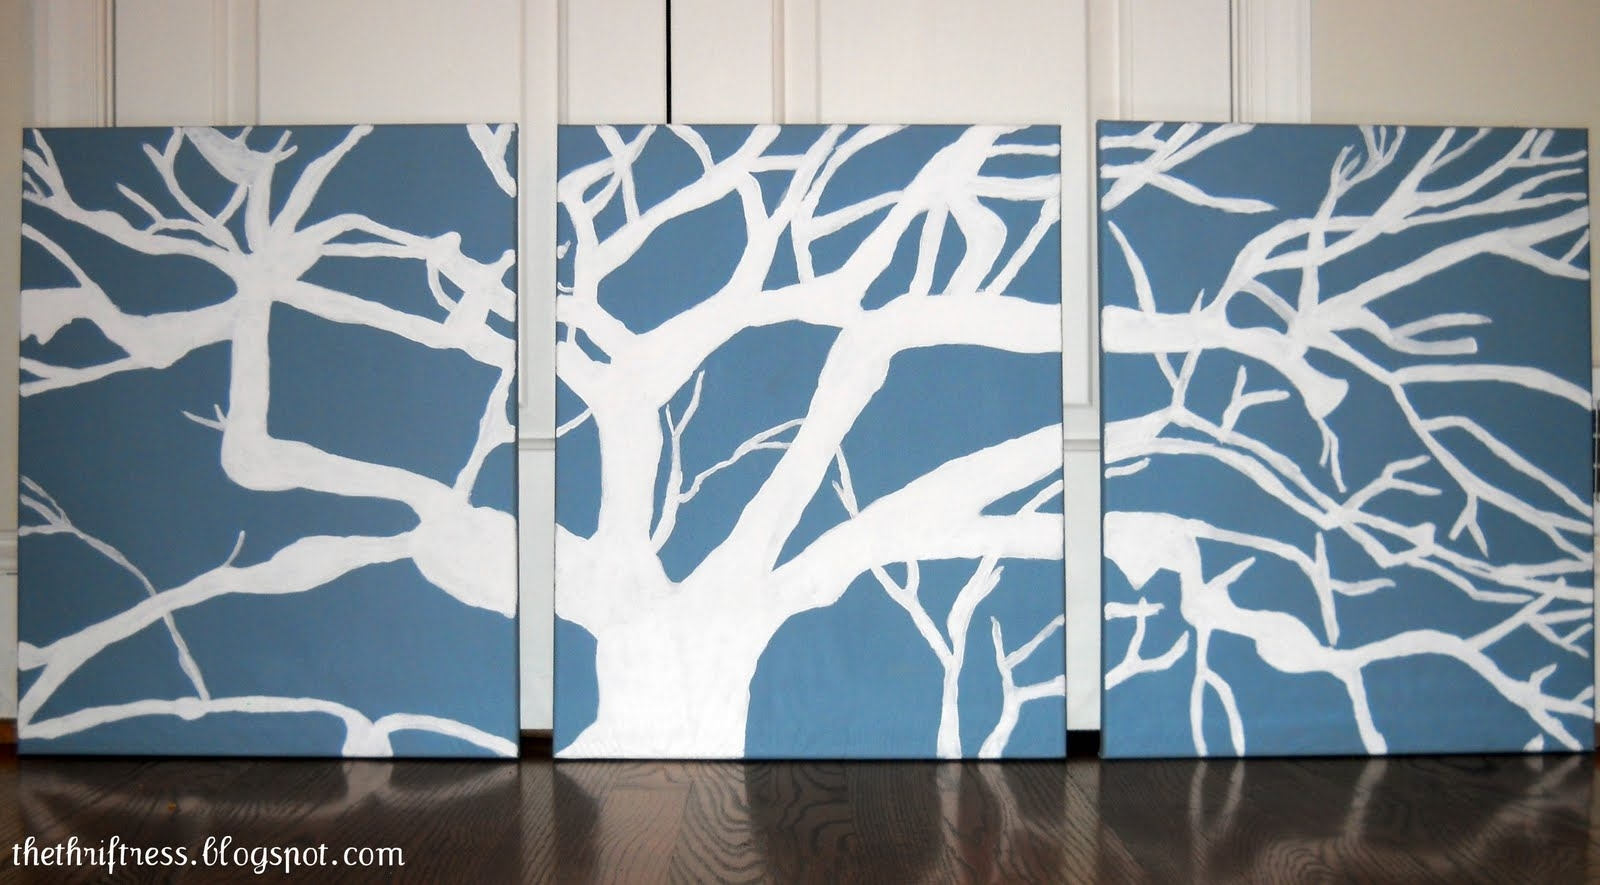 Diy Canvas Wall Art Ideas Stencils Paint - Tierra Este | #28929 in Current Diy Fabric Canvas Wall Art